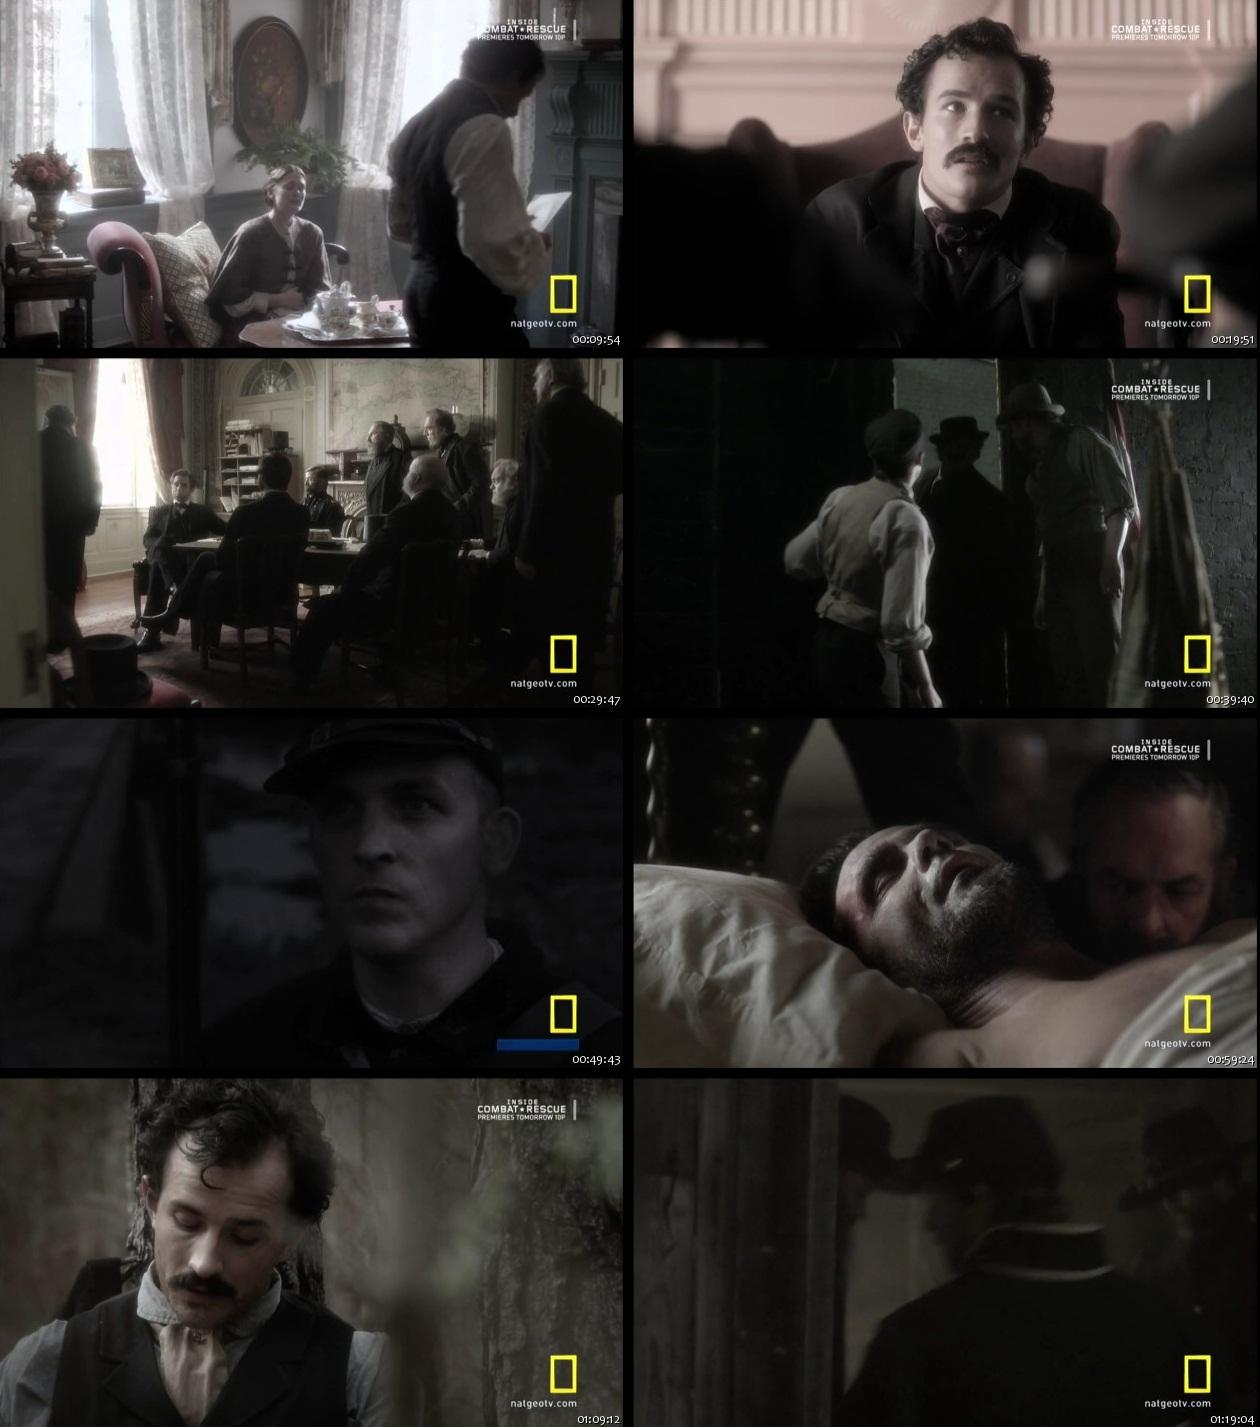 http://3.bp.blogspot.com/-fomEN2xZ_Zg/UT2-ocmH1ZI/AAAAAAAAUcQ/nAbBNd4yoXg/s1600/Killing+Lincoln+(2013)+HDTV+720p+Screen.jpg